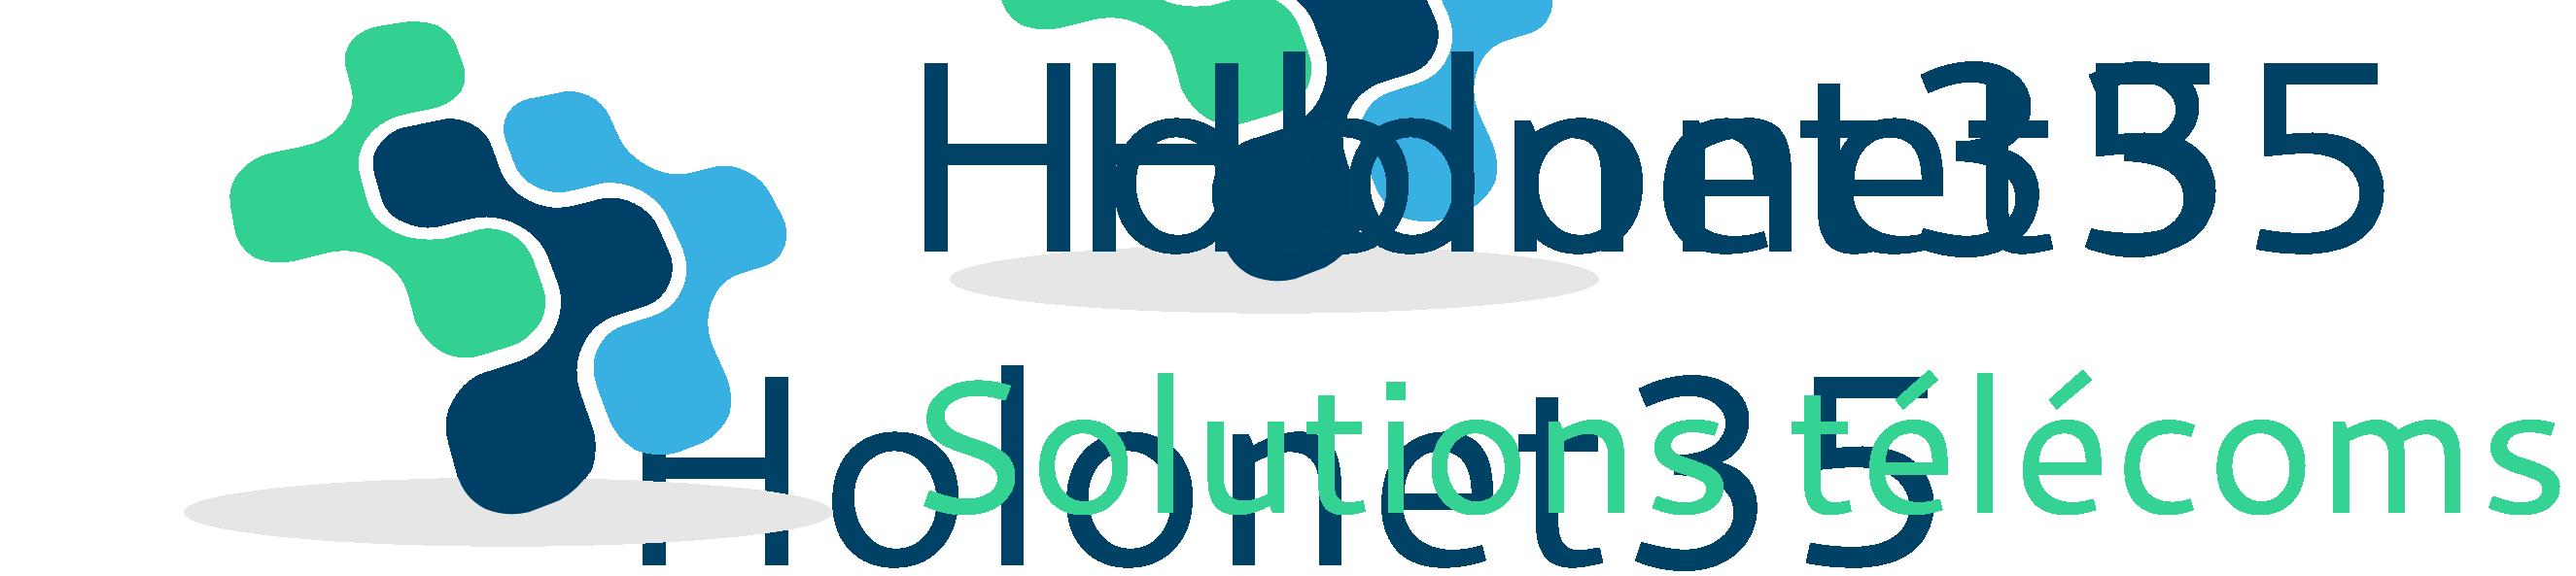 Holonet35